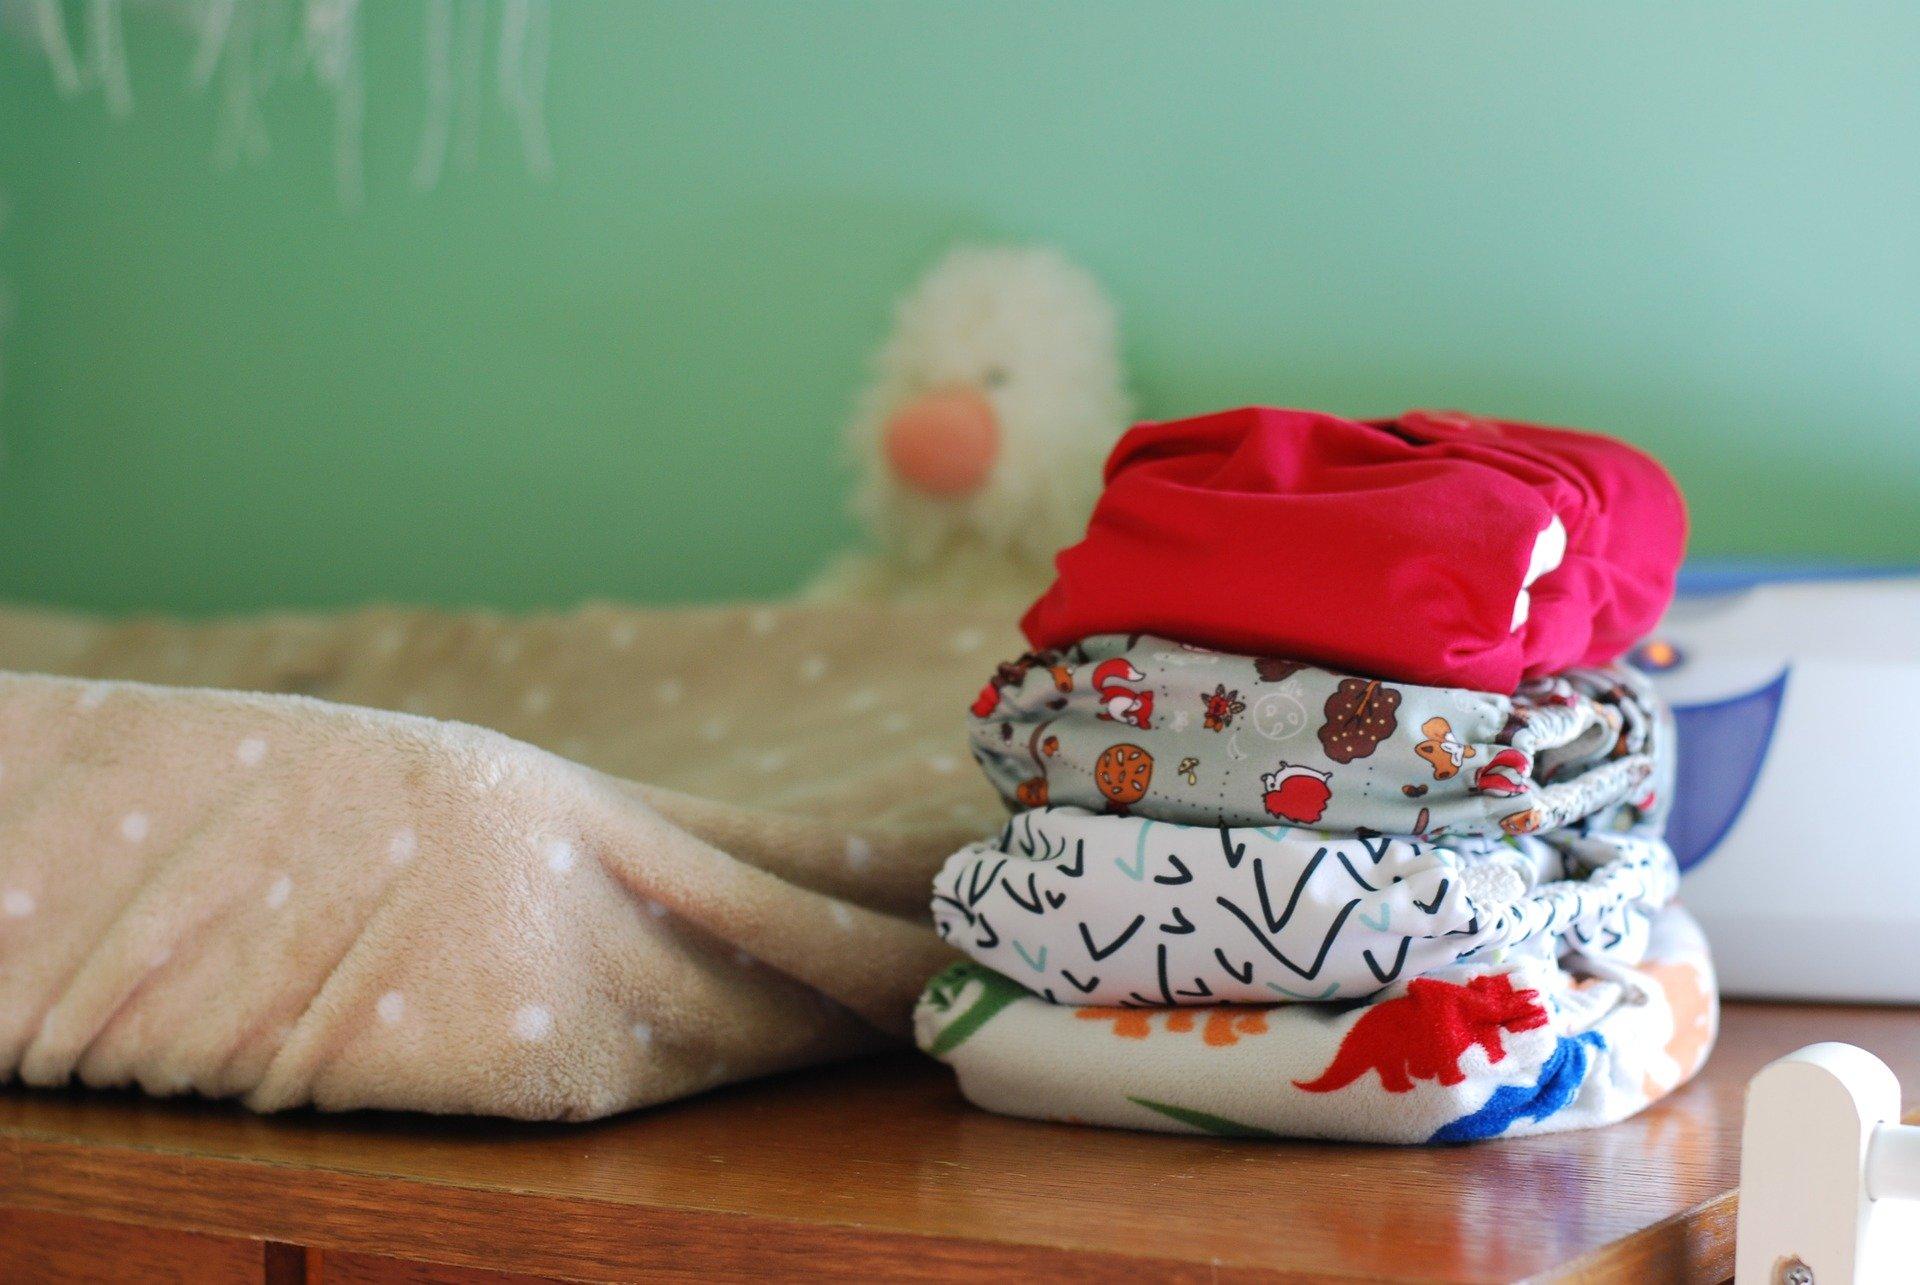 Diaper Repair for Courtney